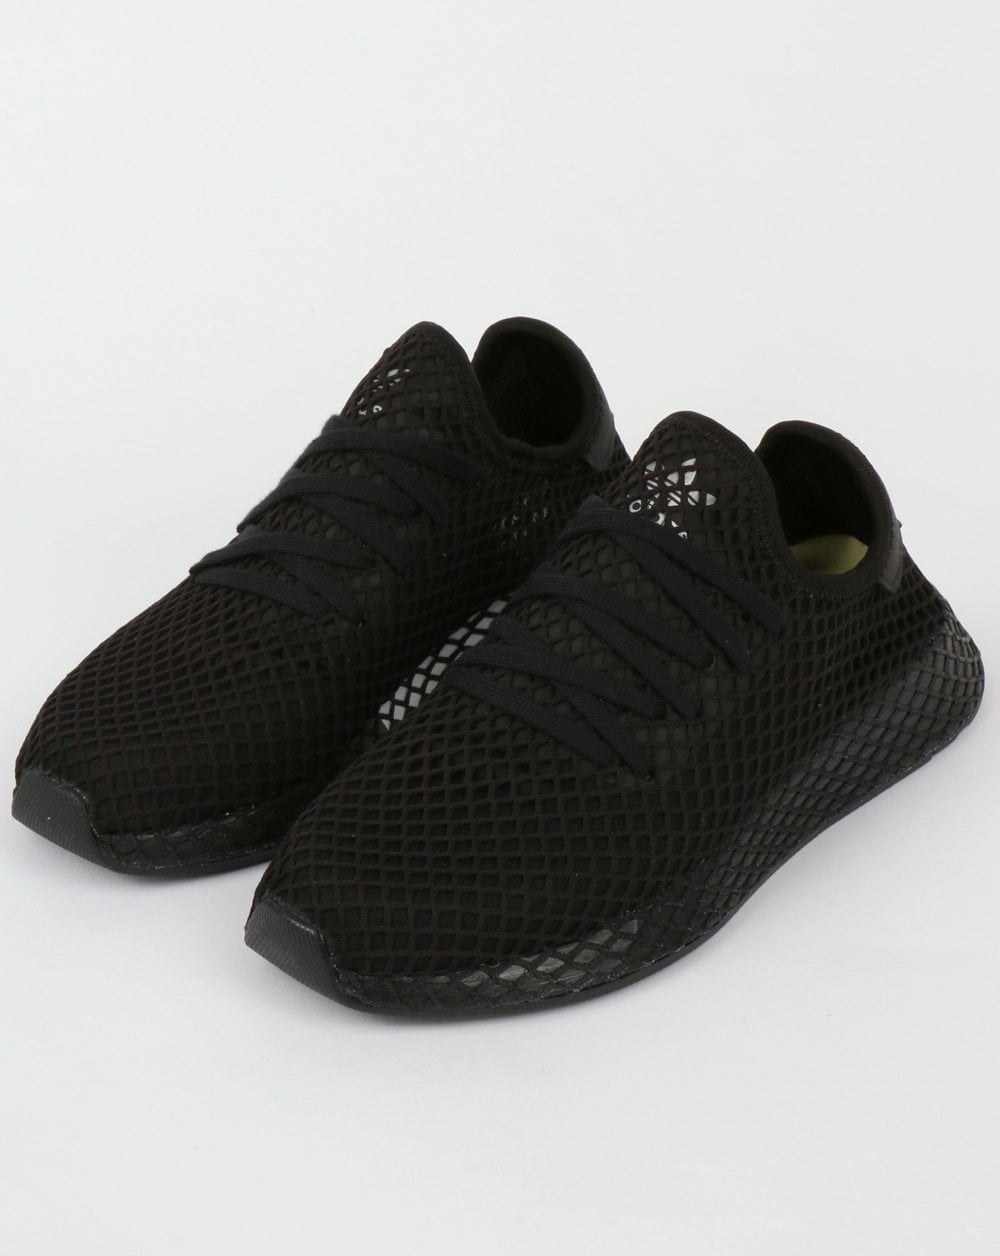 Adidas Deerupt Runner Trainers Black